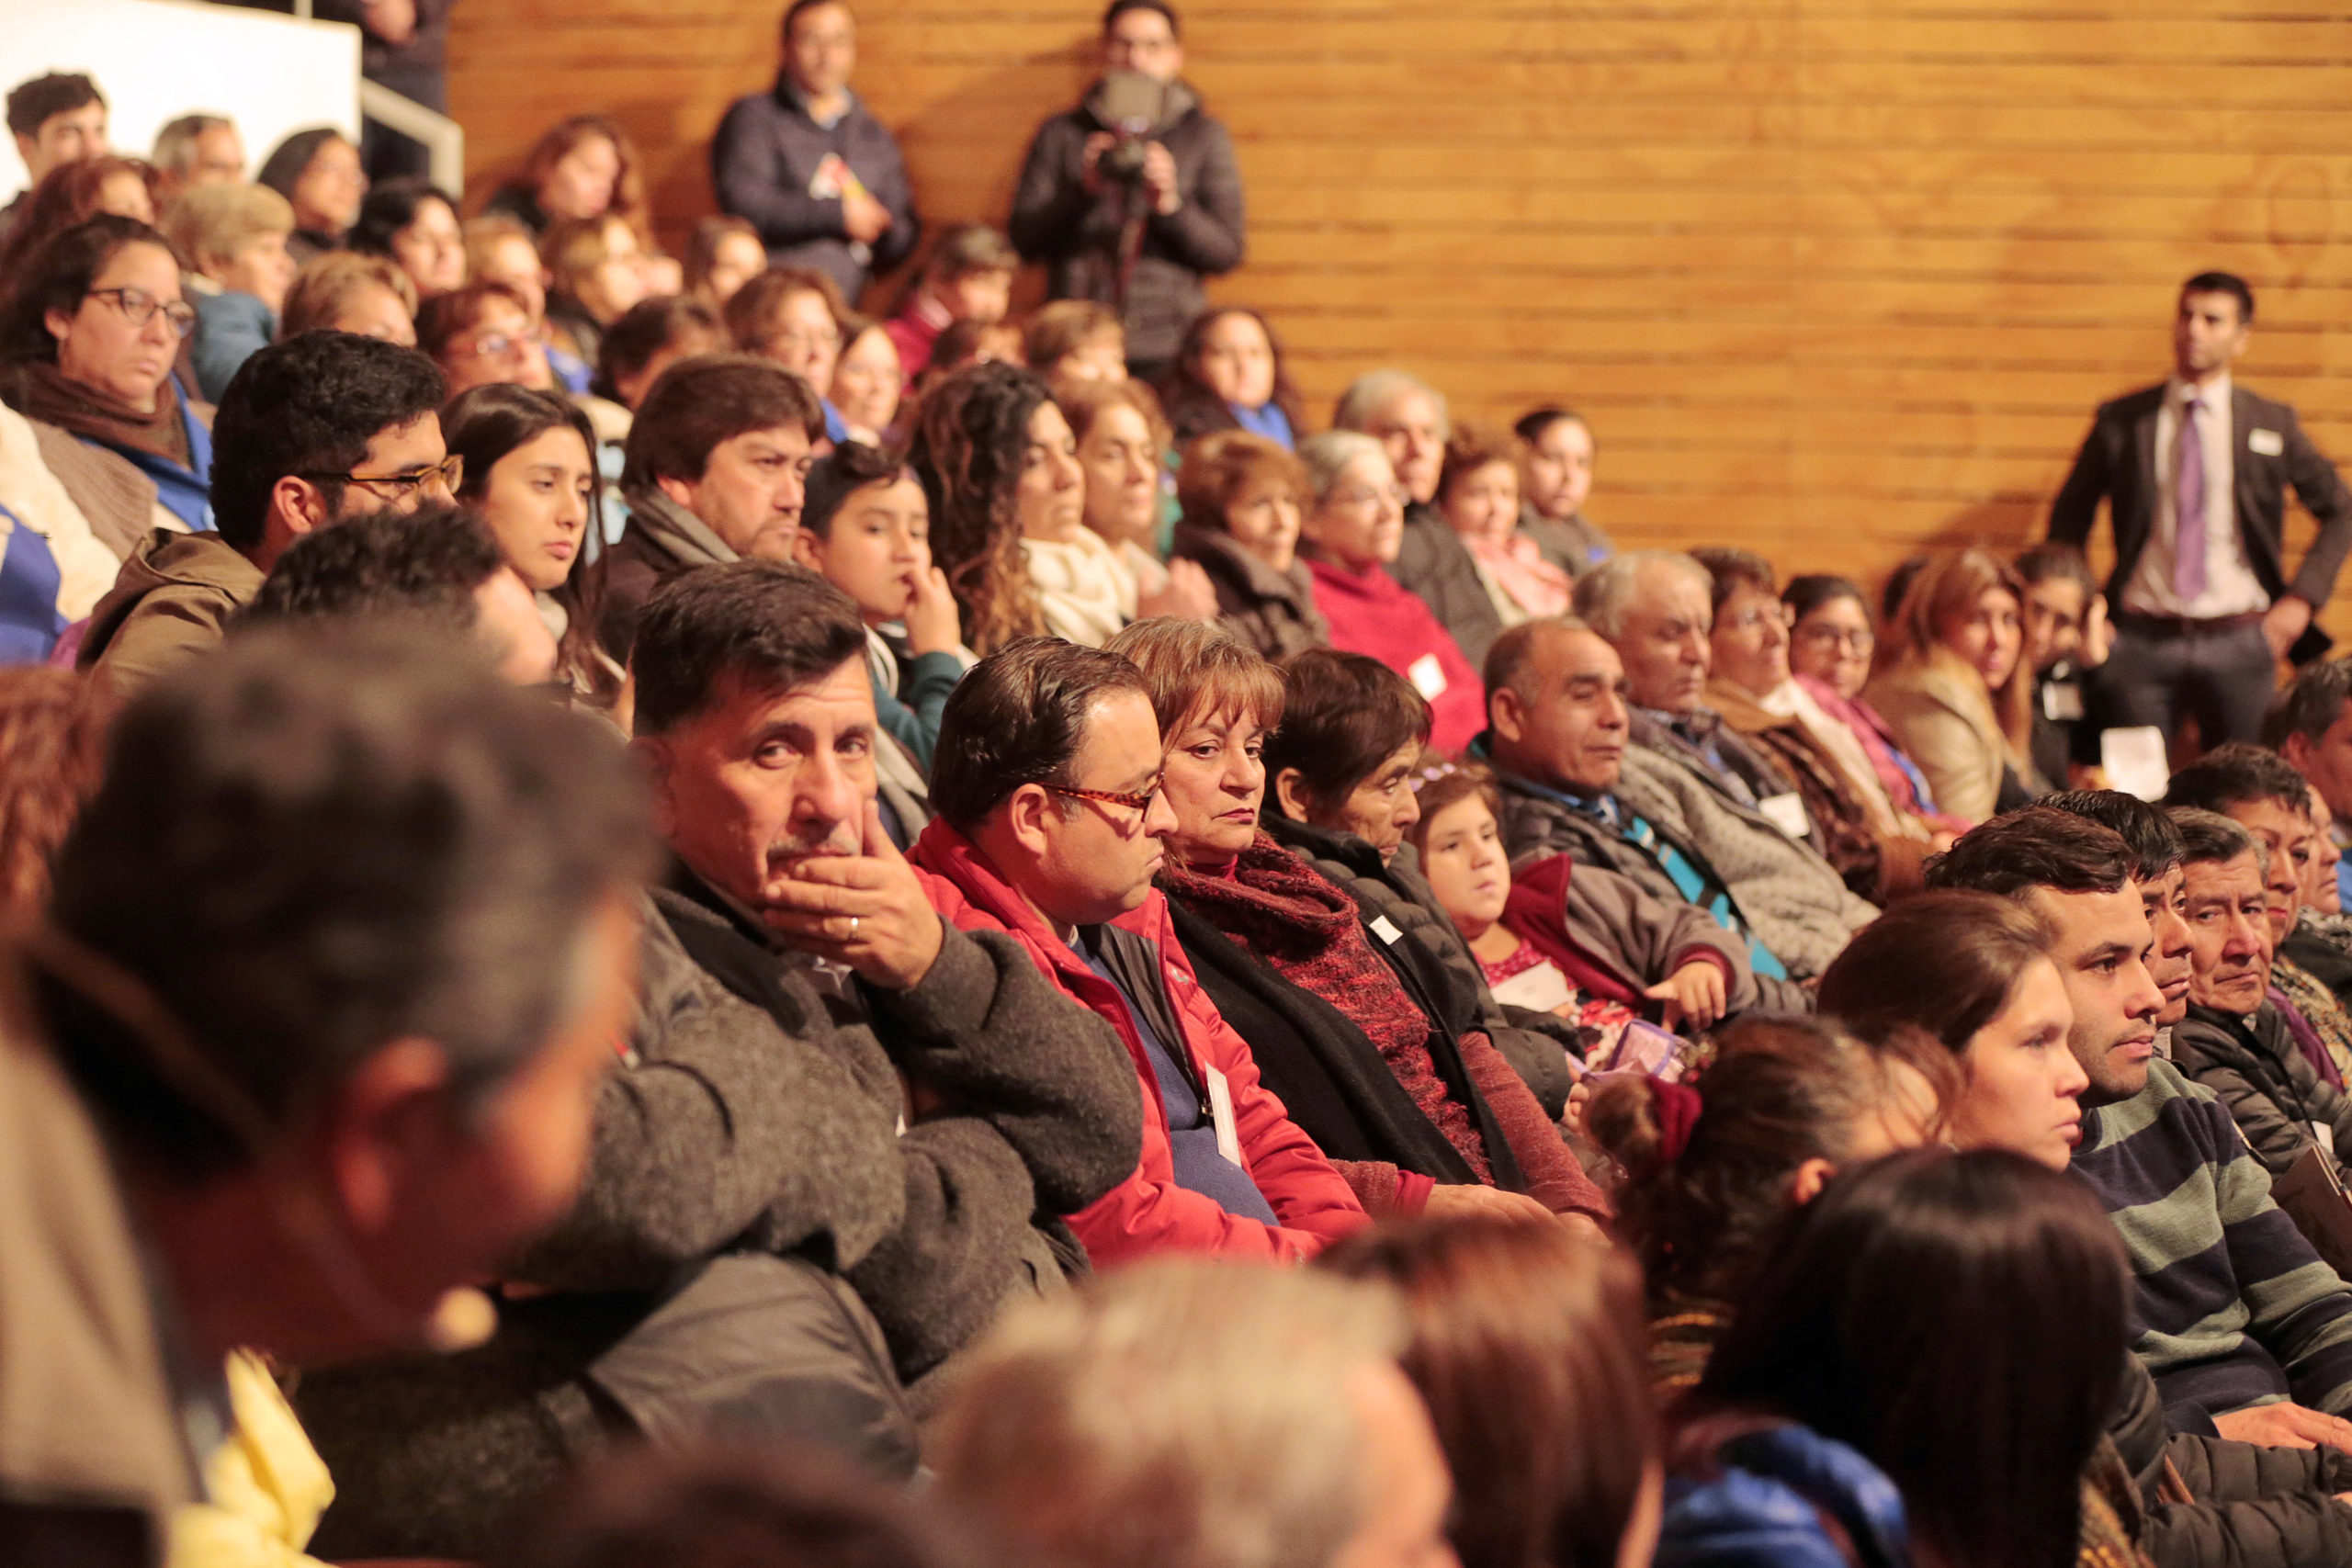 Foto gente escuchando charlas